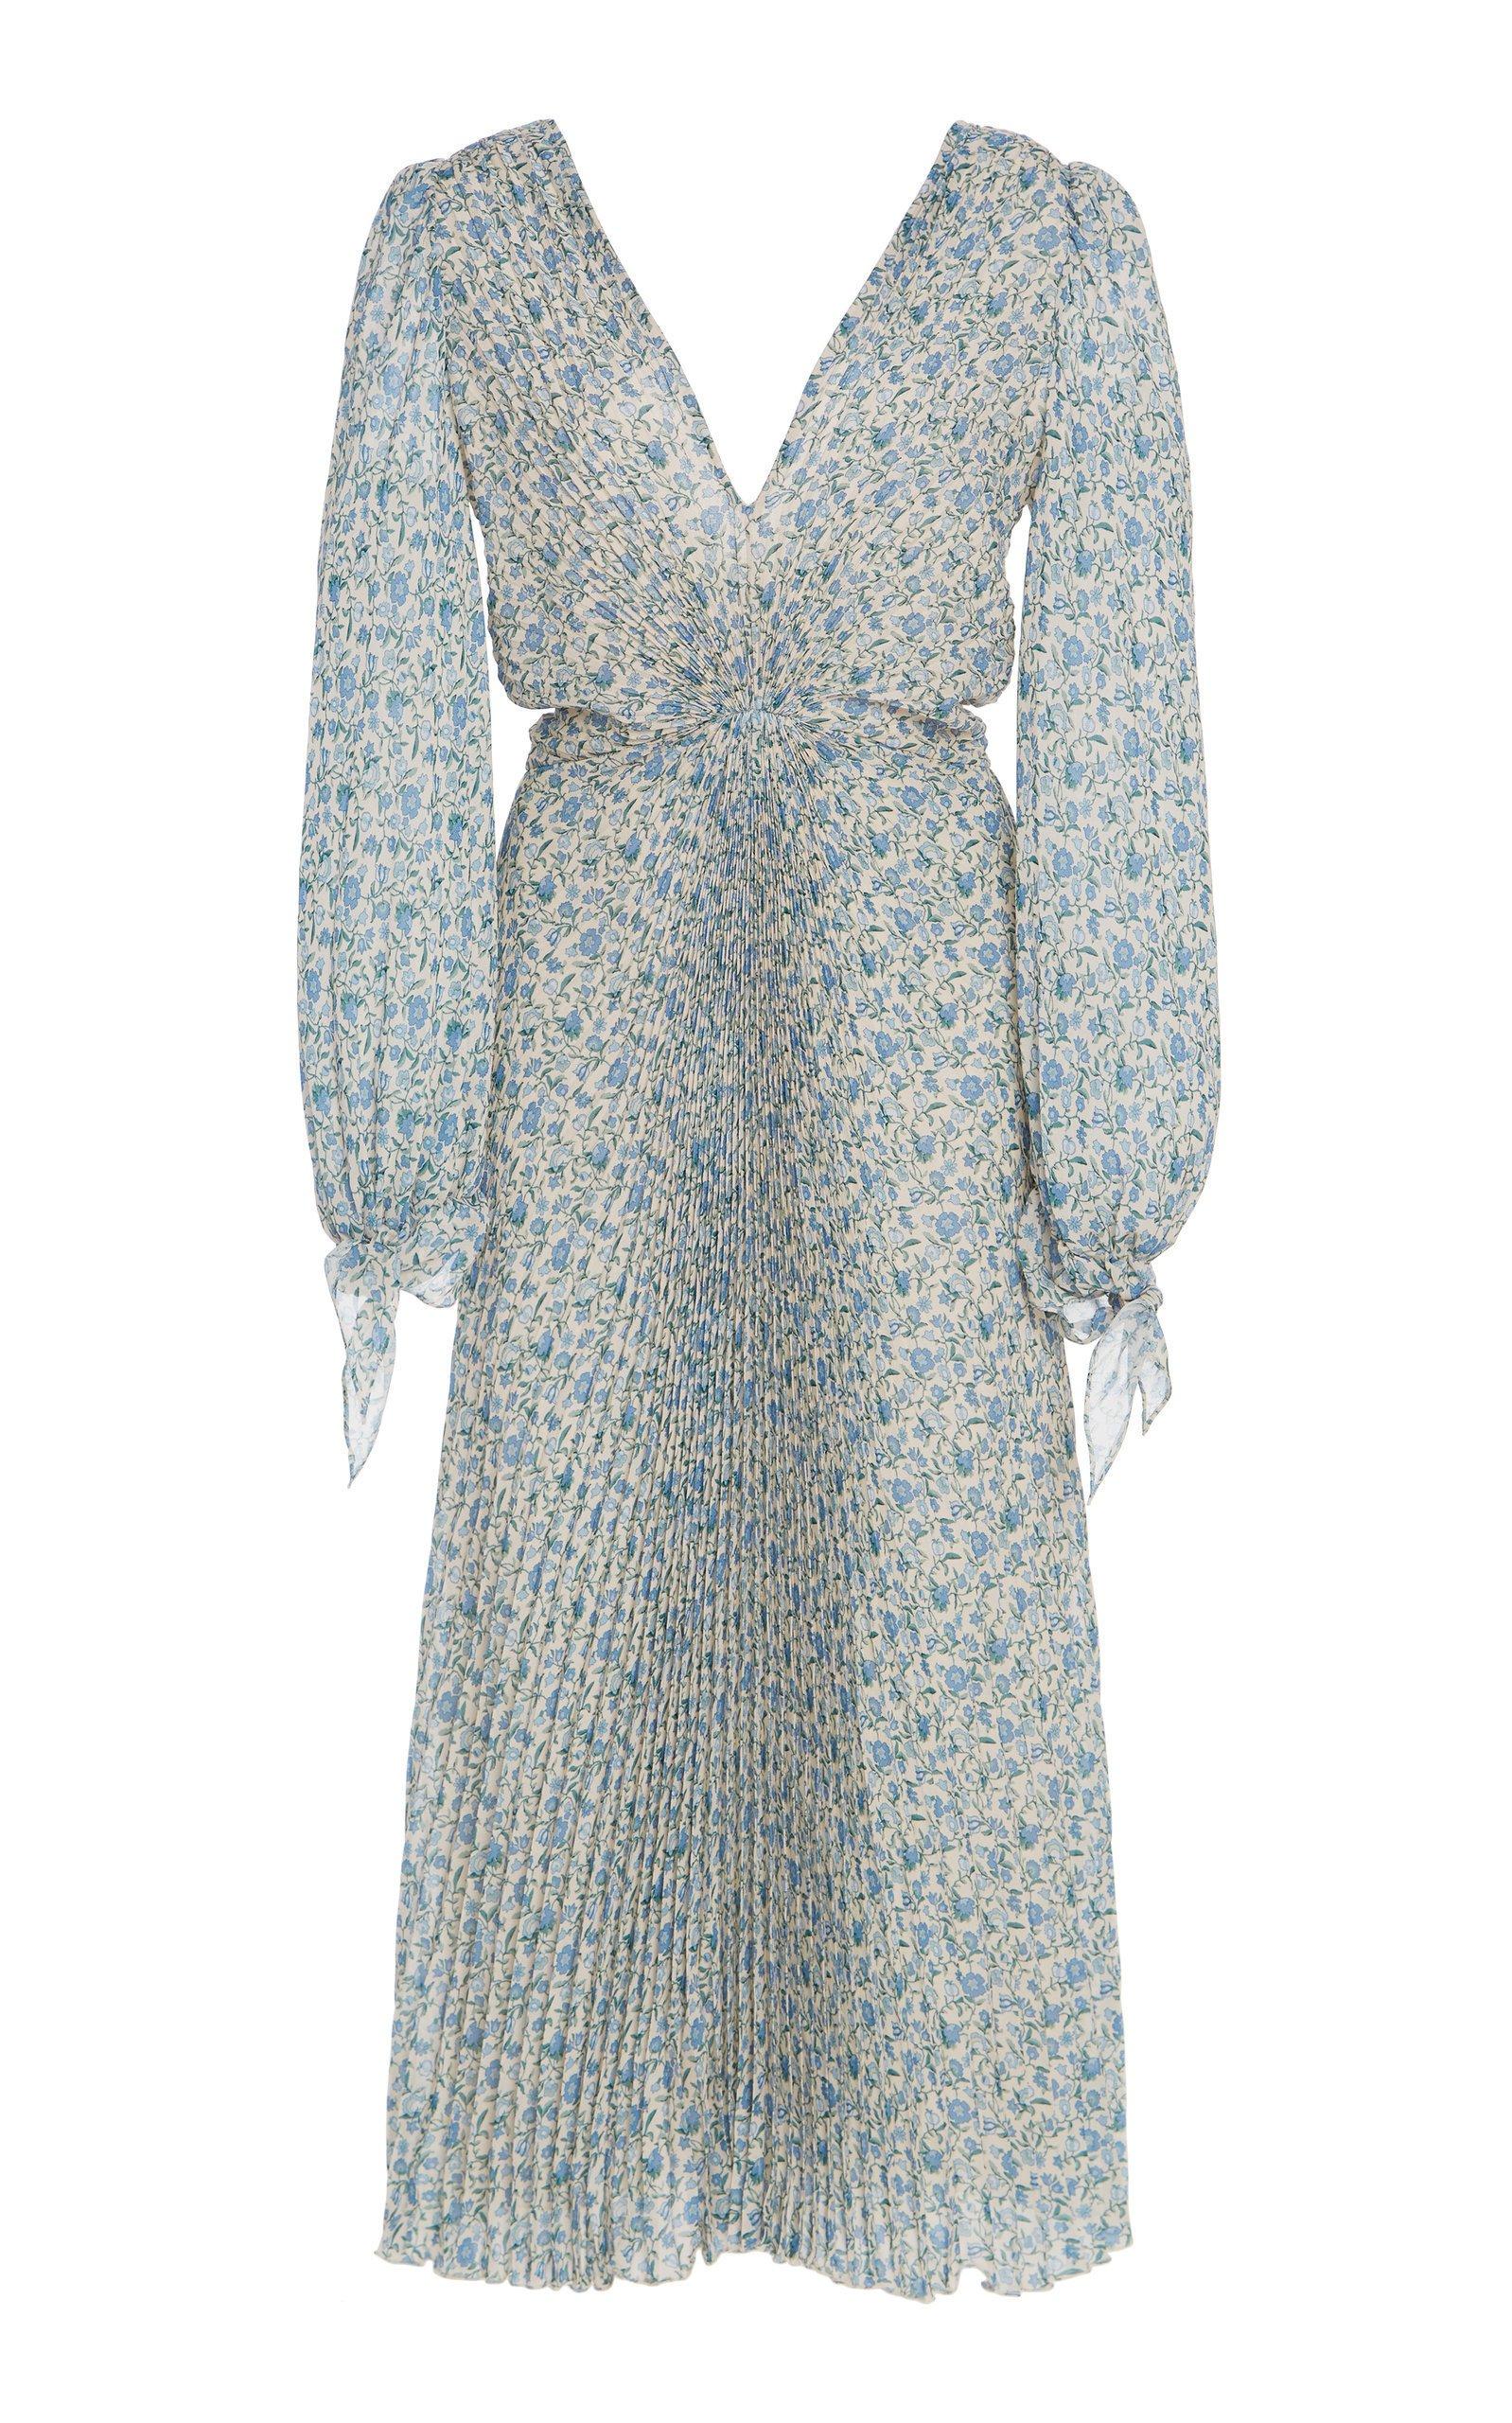 Luisa Beccaria Pleated Micro Floral Midi Dress